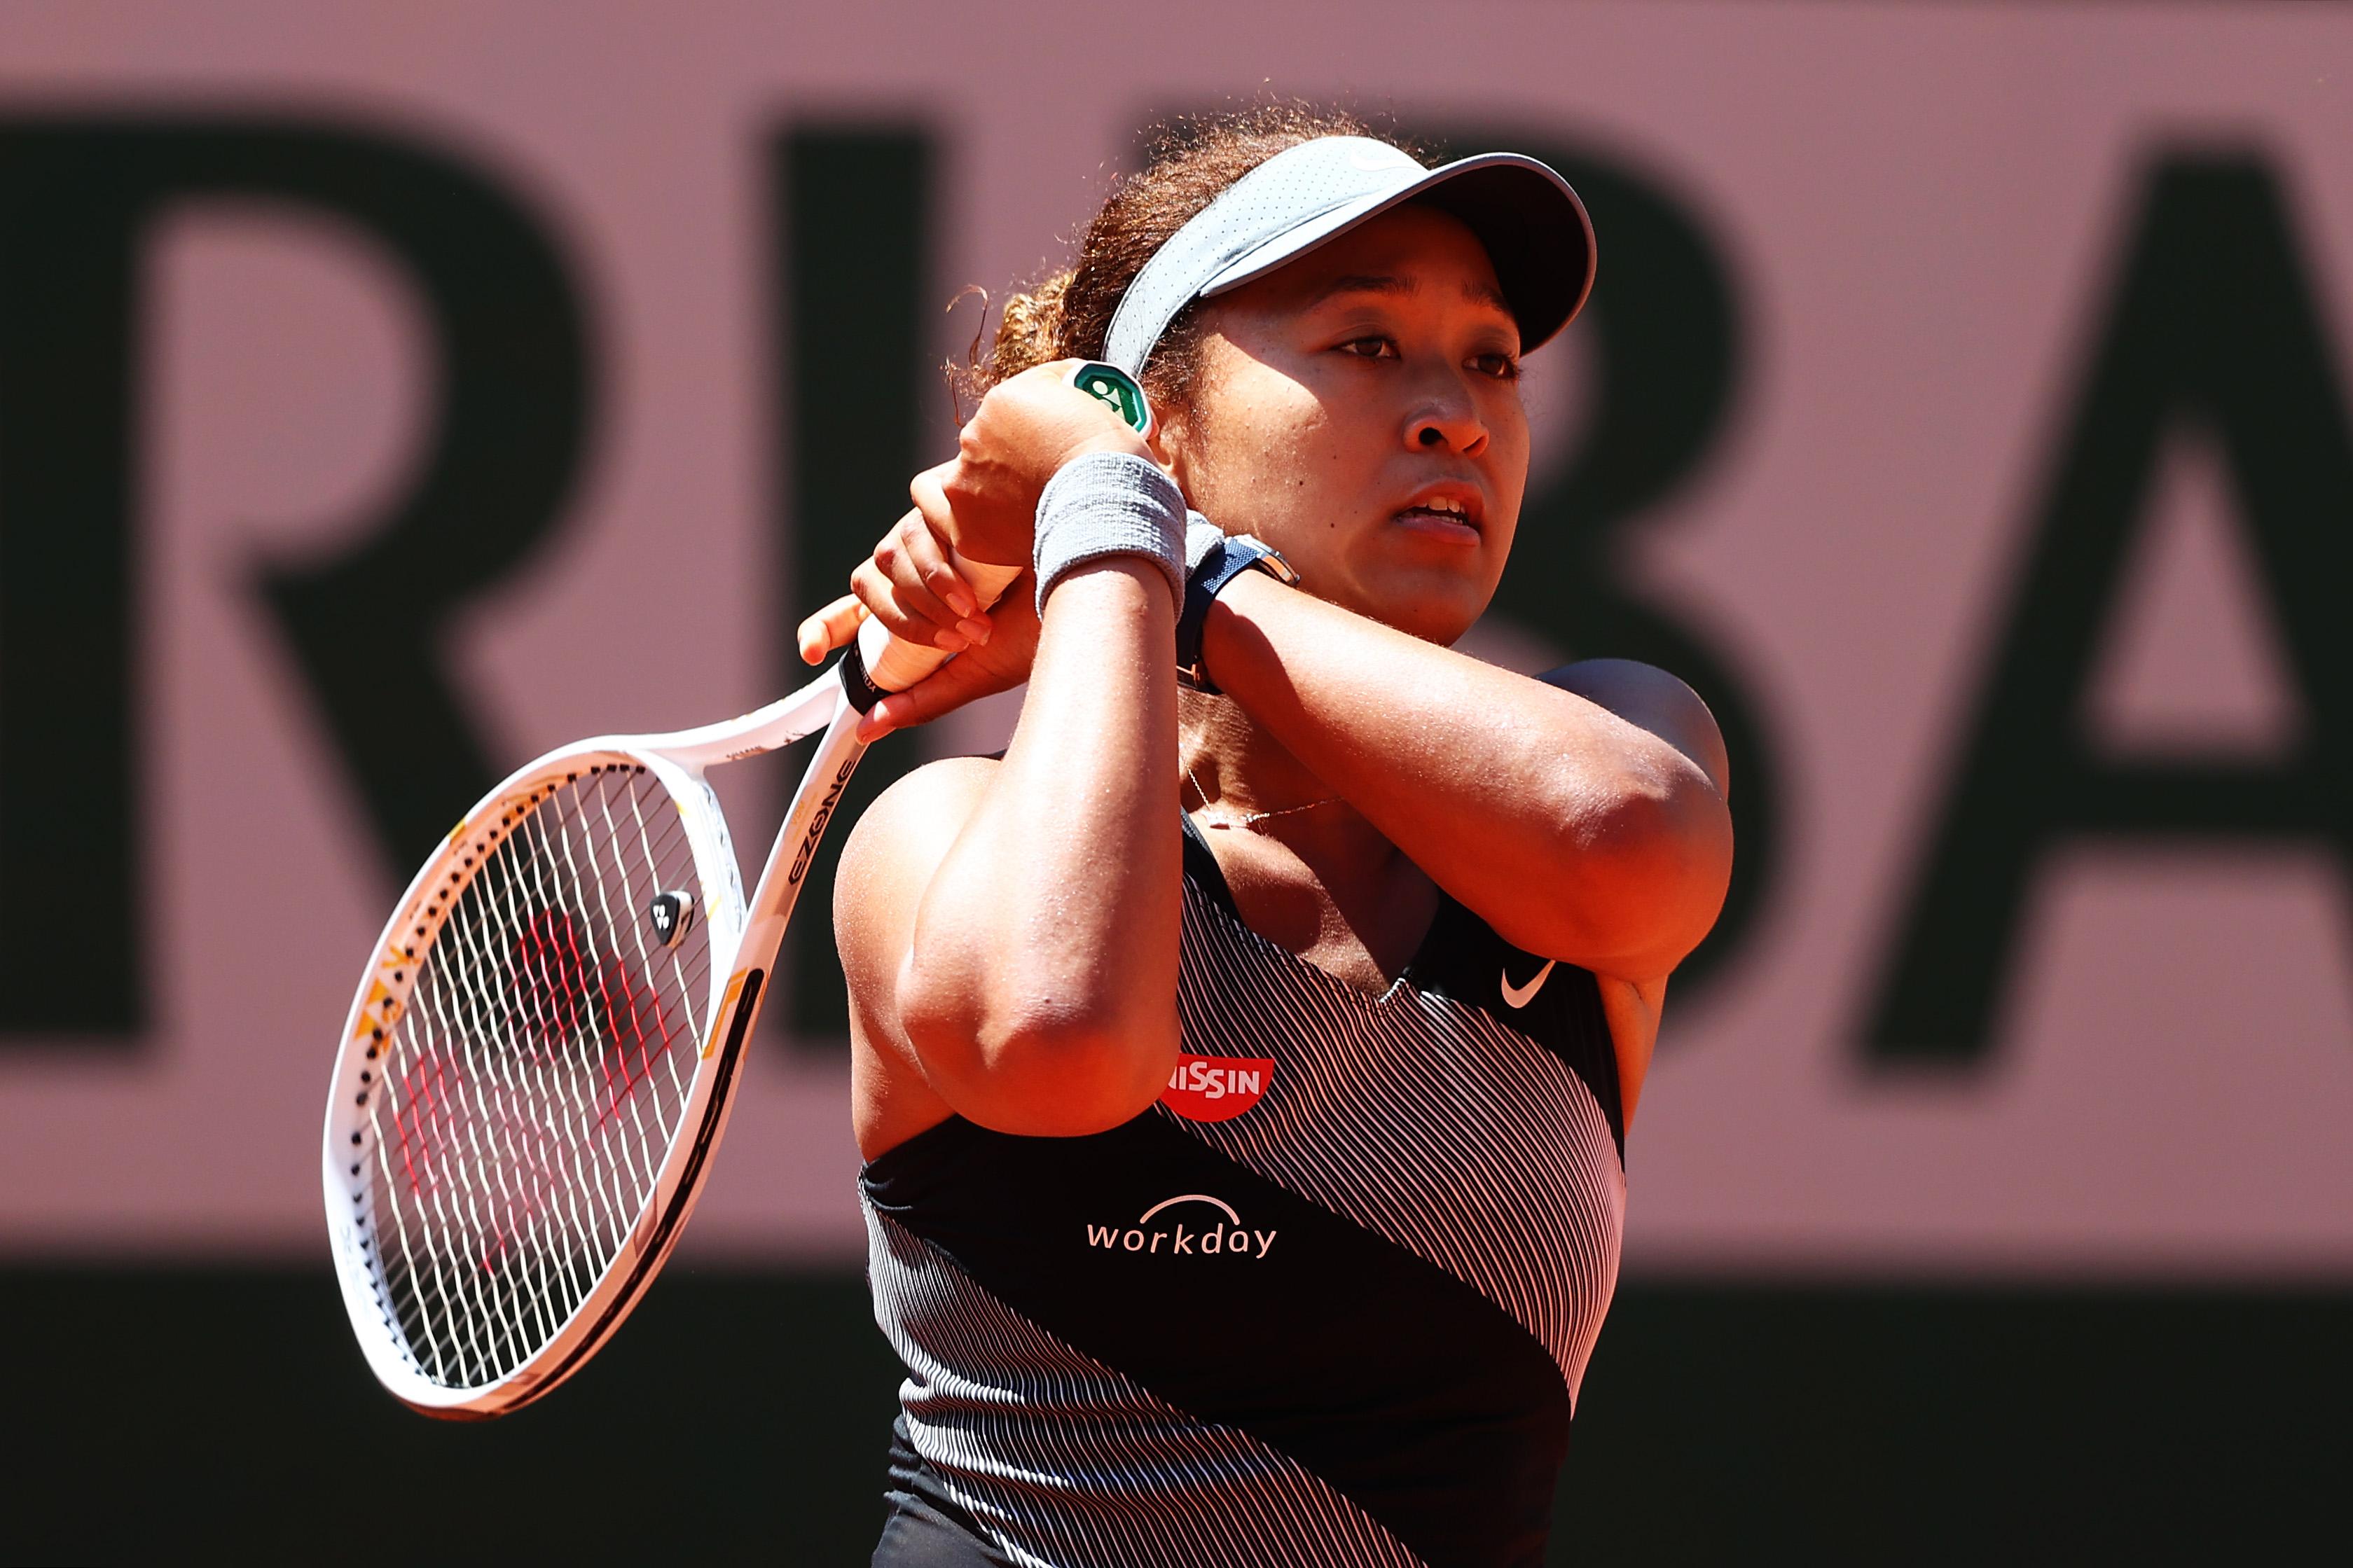 Naomi Osaka will miss Wimbledon but plans on Tokyo Olympics return, says agent